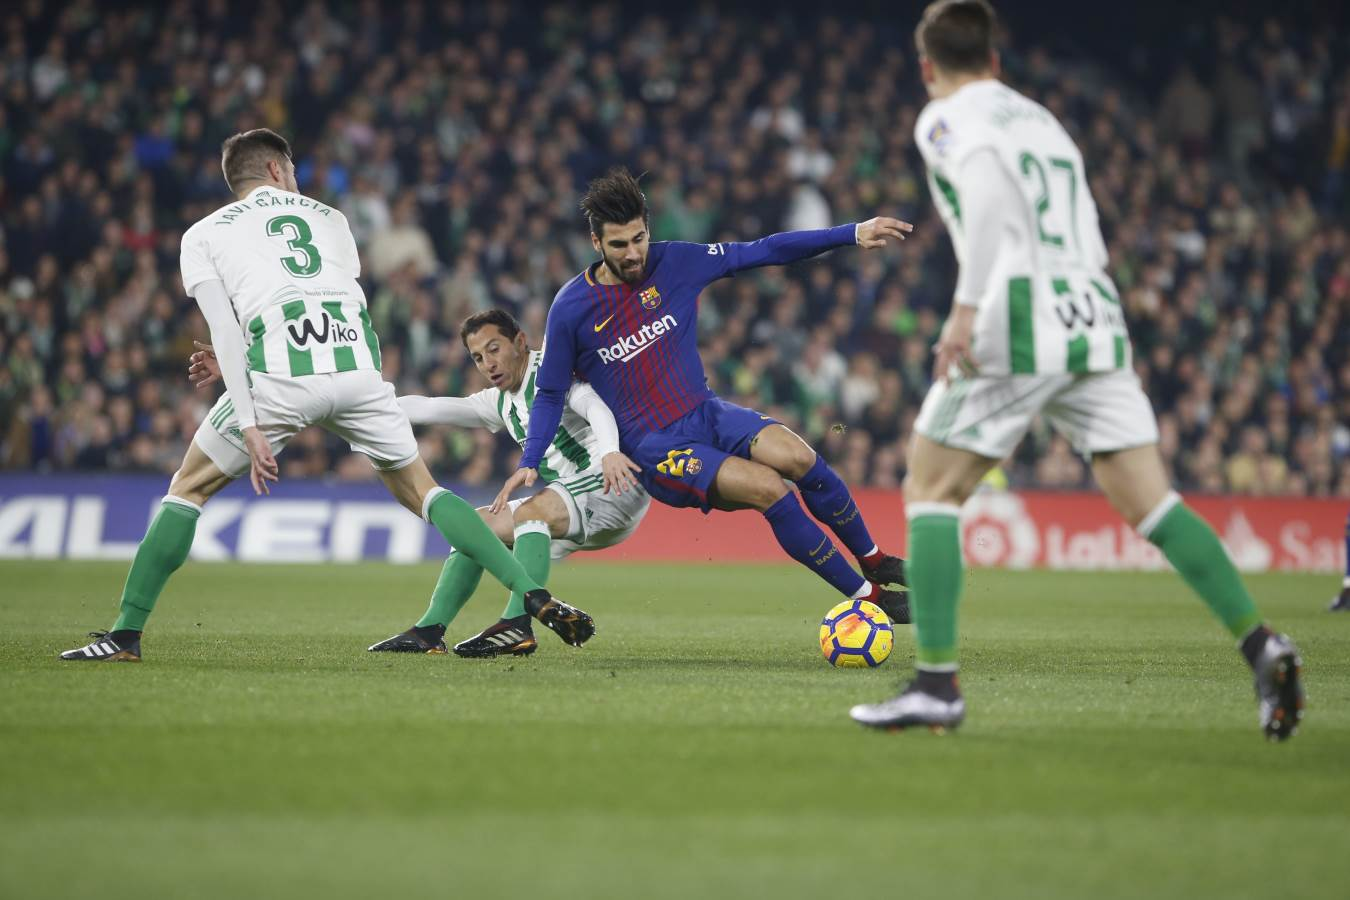 18: Plenty of intensity from both teams so far. Come on Barça! (0-0) #BetisBarça https://t.co/funPK5MoGo